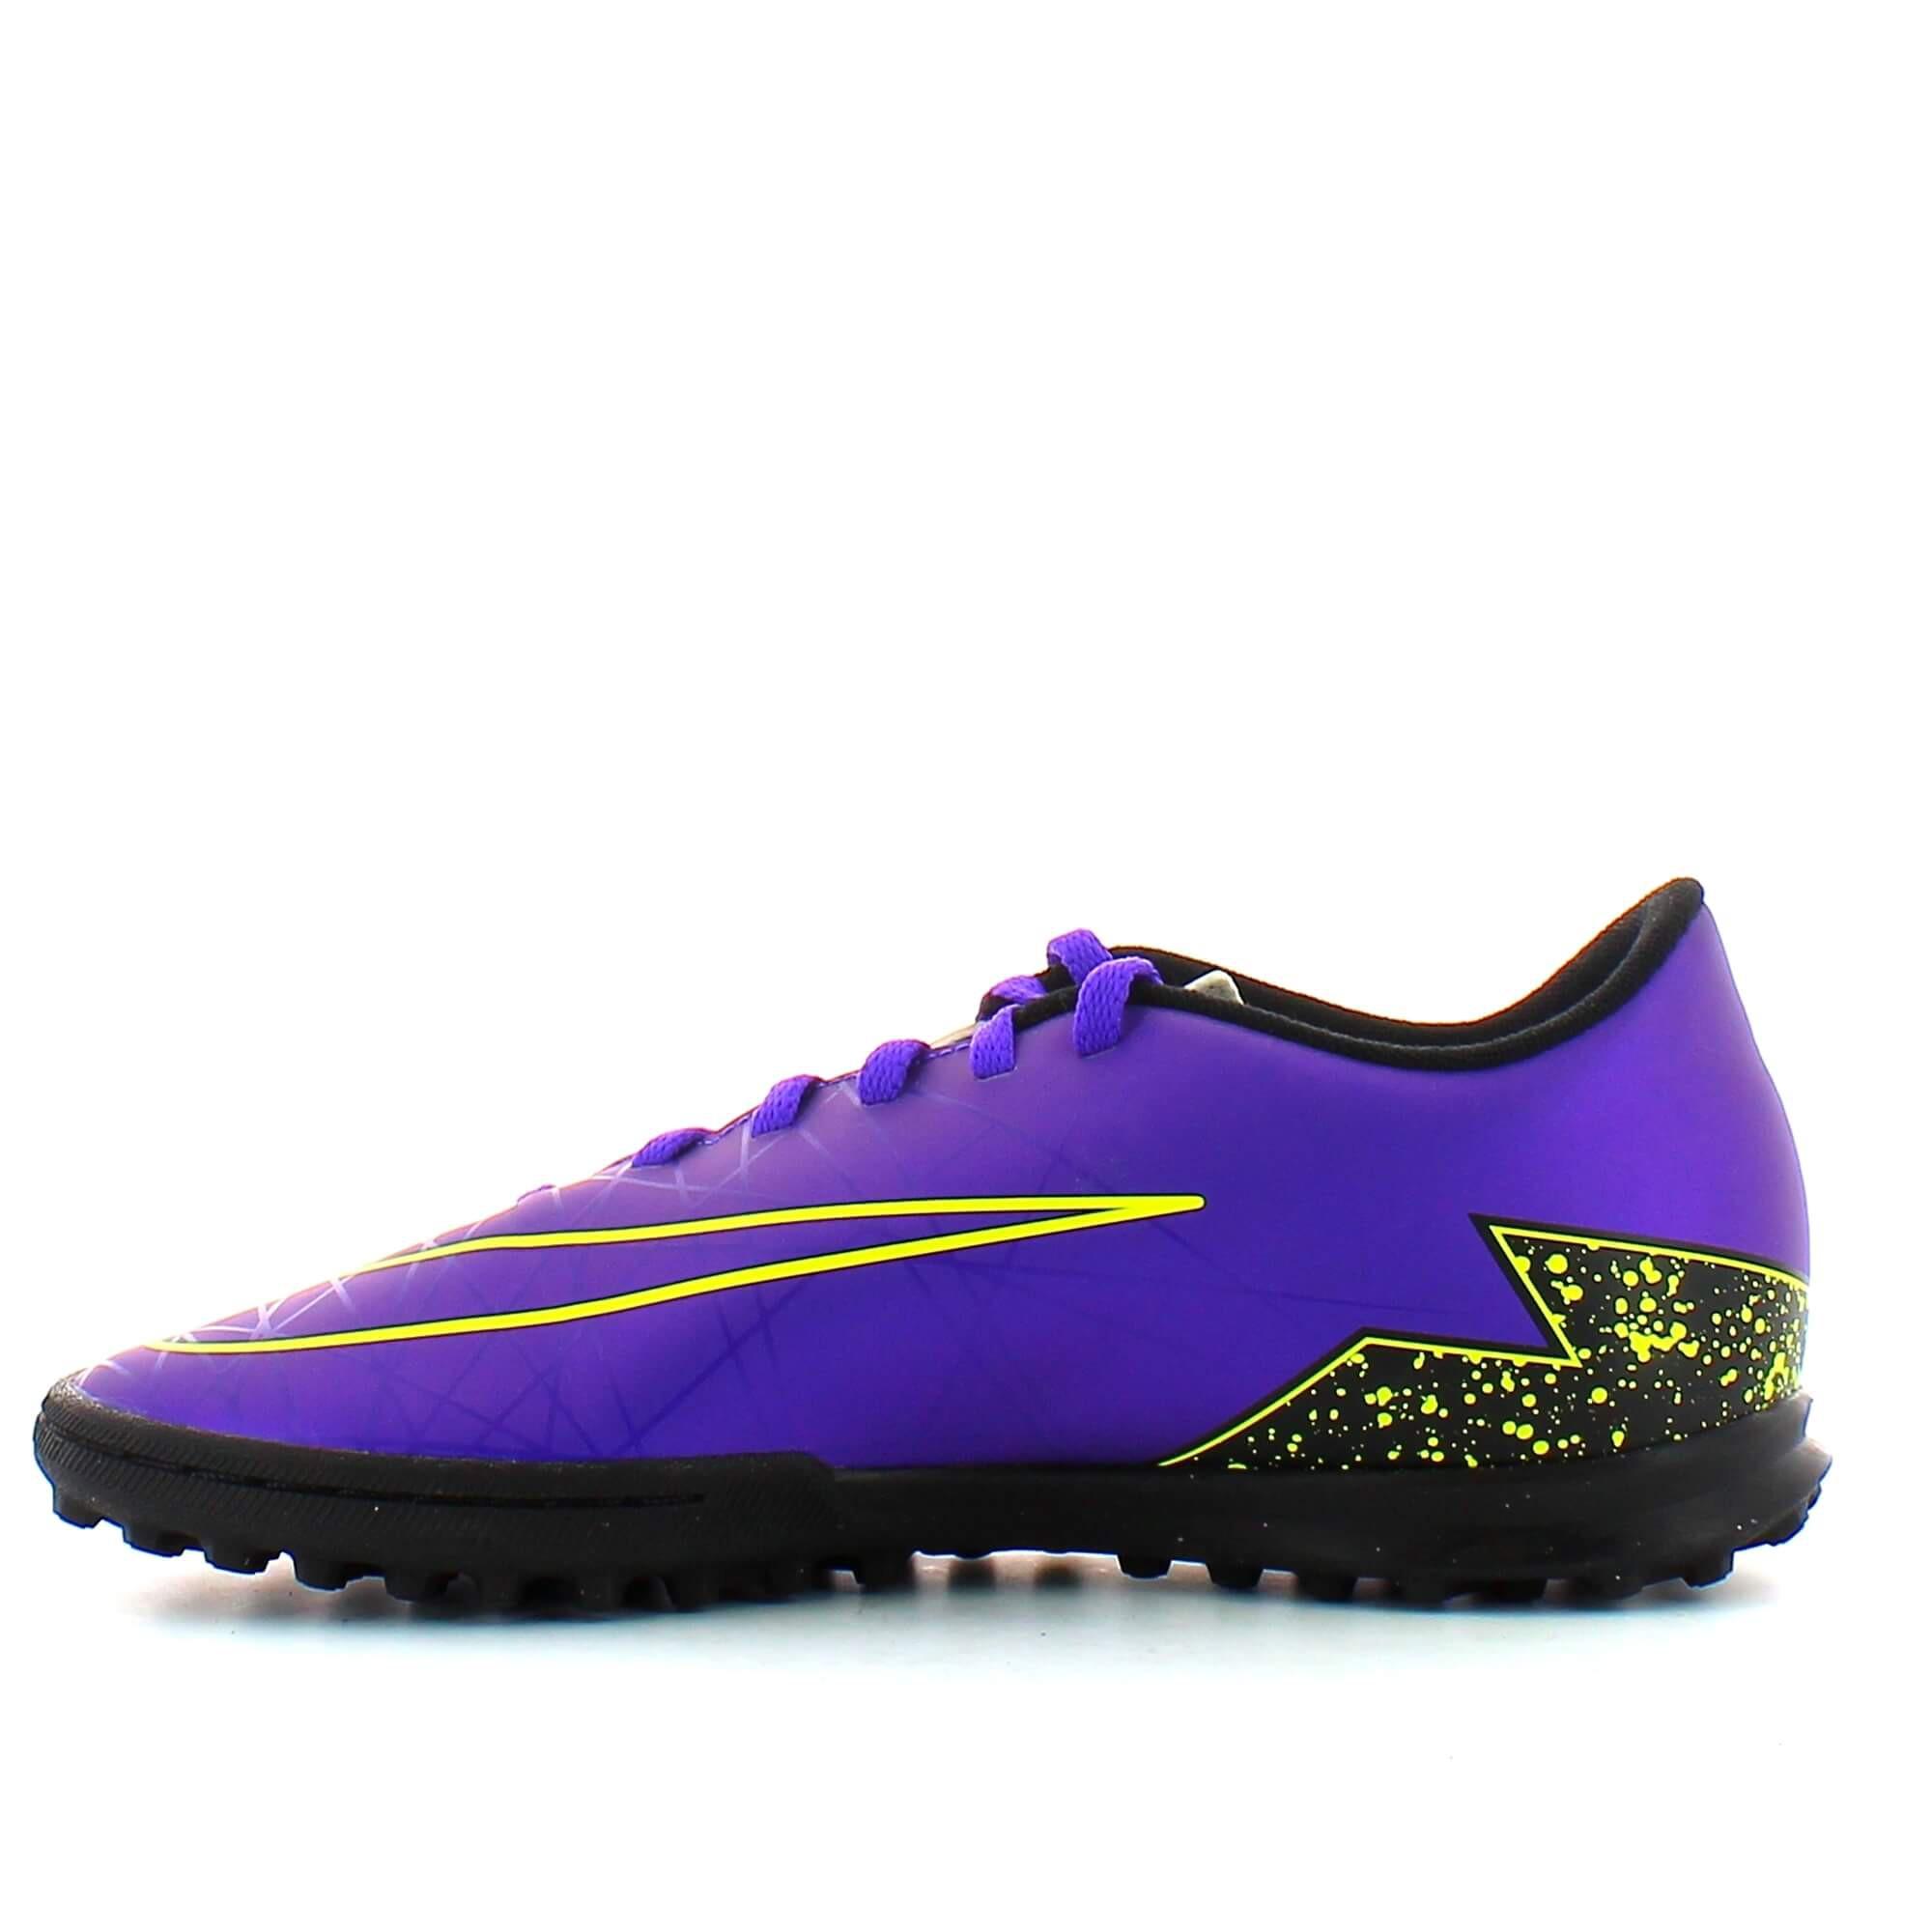 5432bbb03b271 Botas Fútbol Nike Hypervenom Phade II Turf Morado Hombre - Deportes Moya